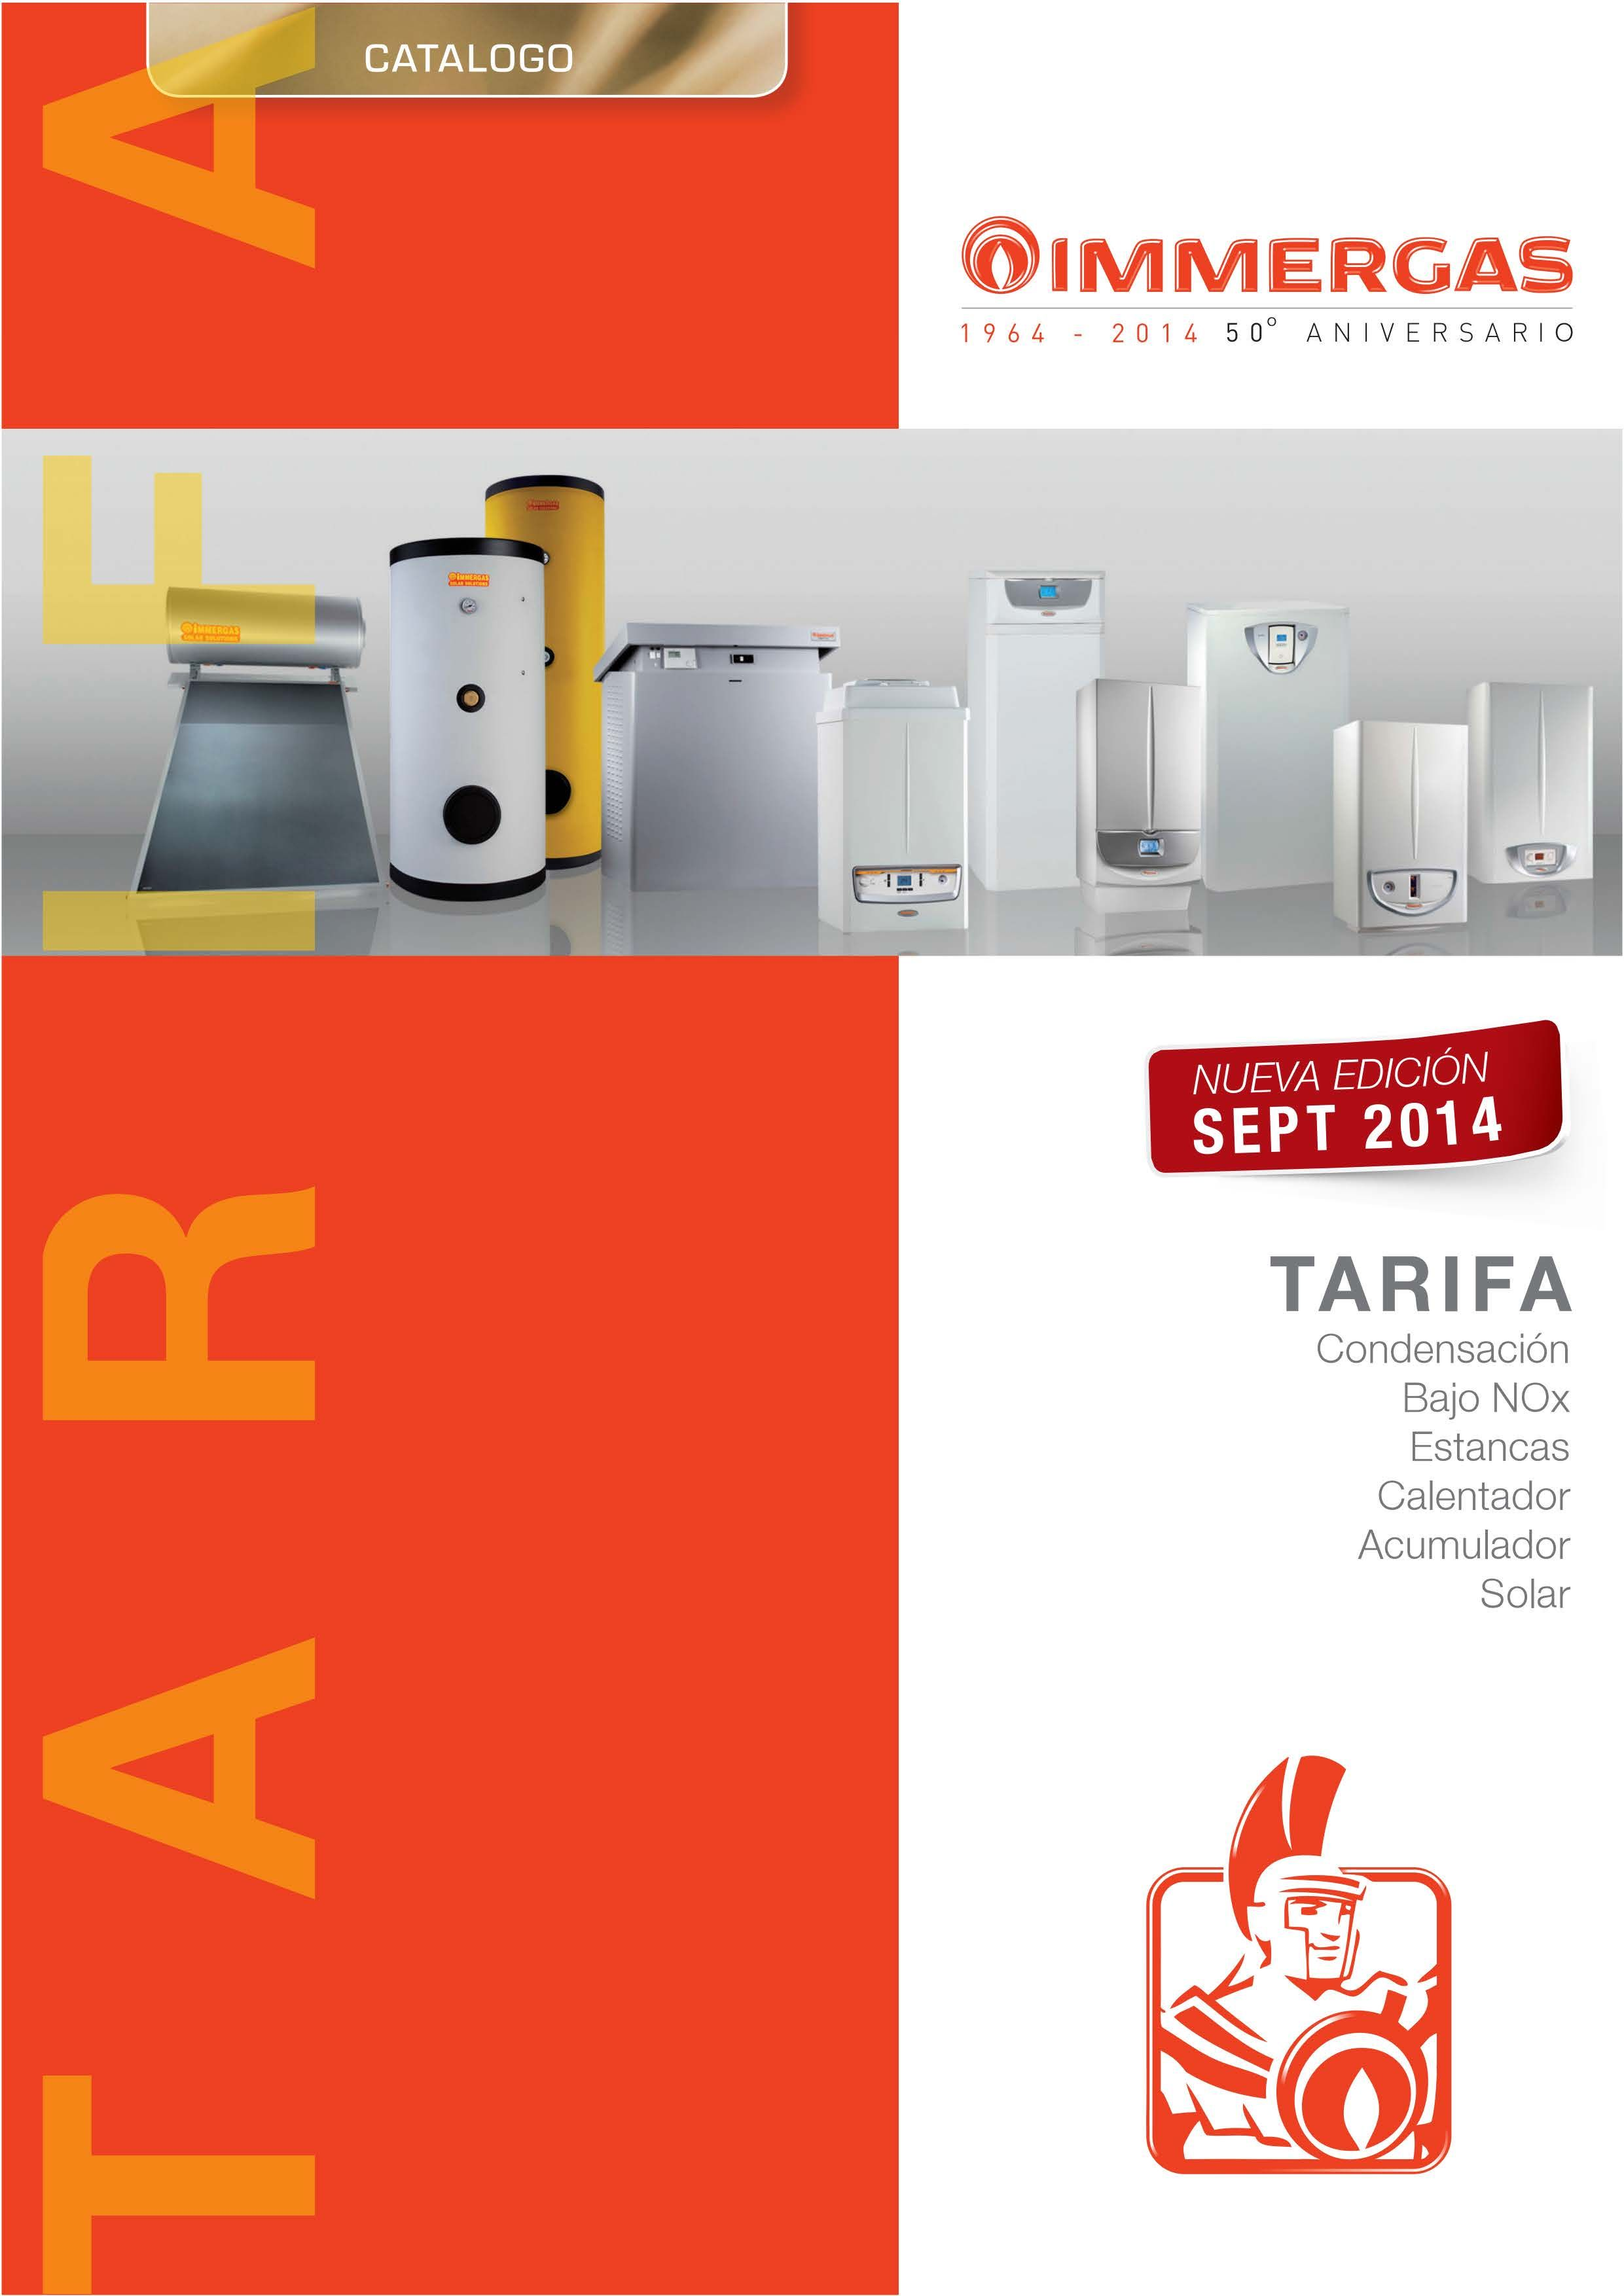 Catálogo-Tarifa IMMERGAS 2014